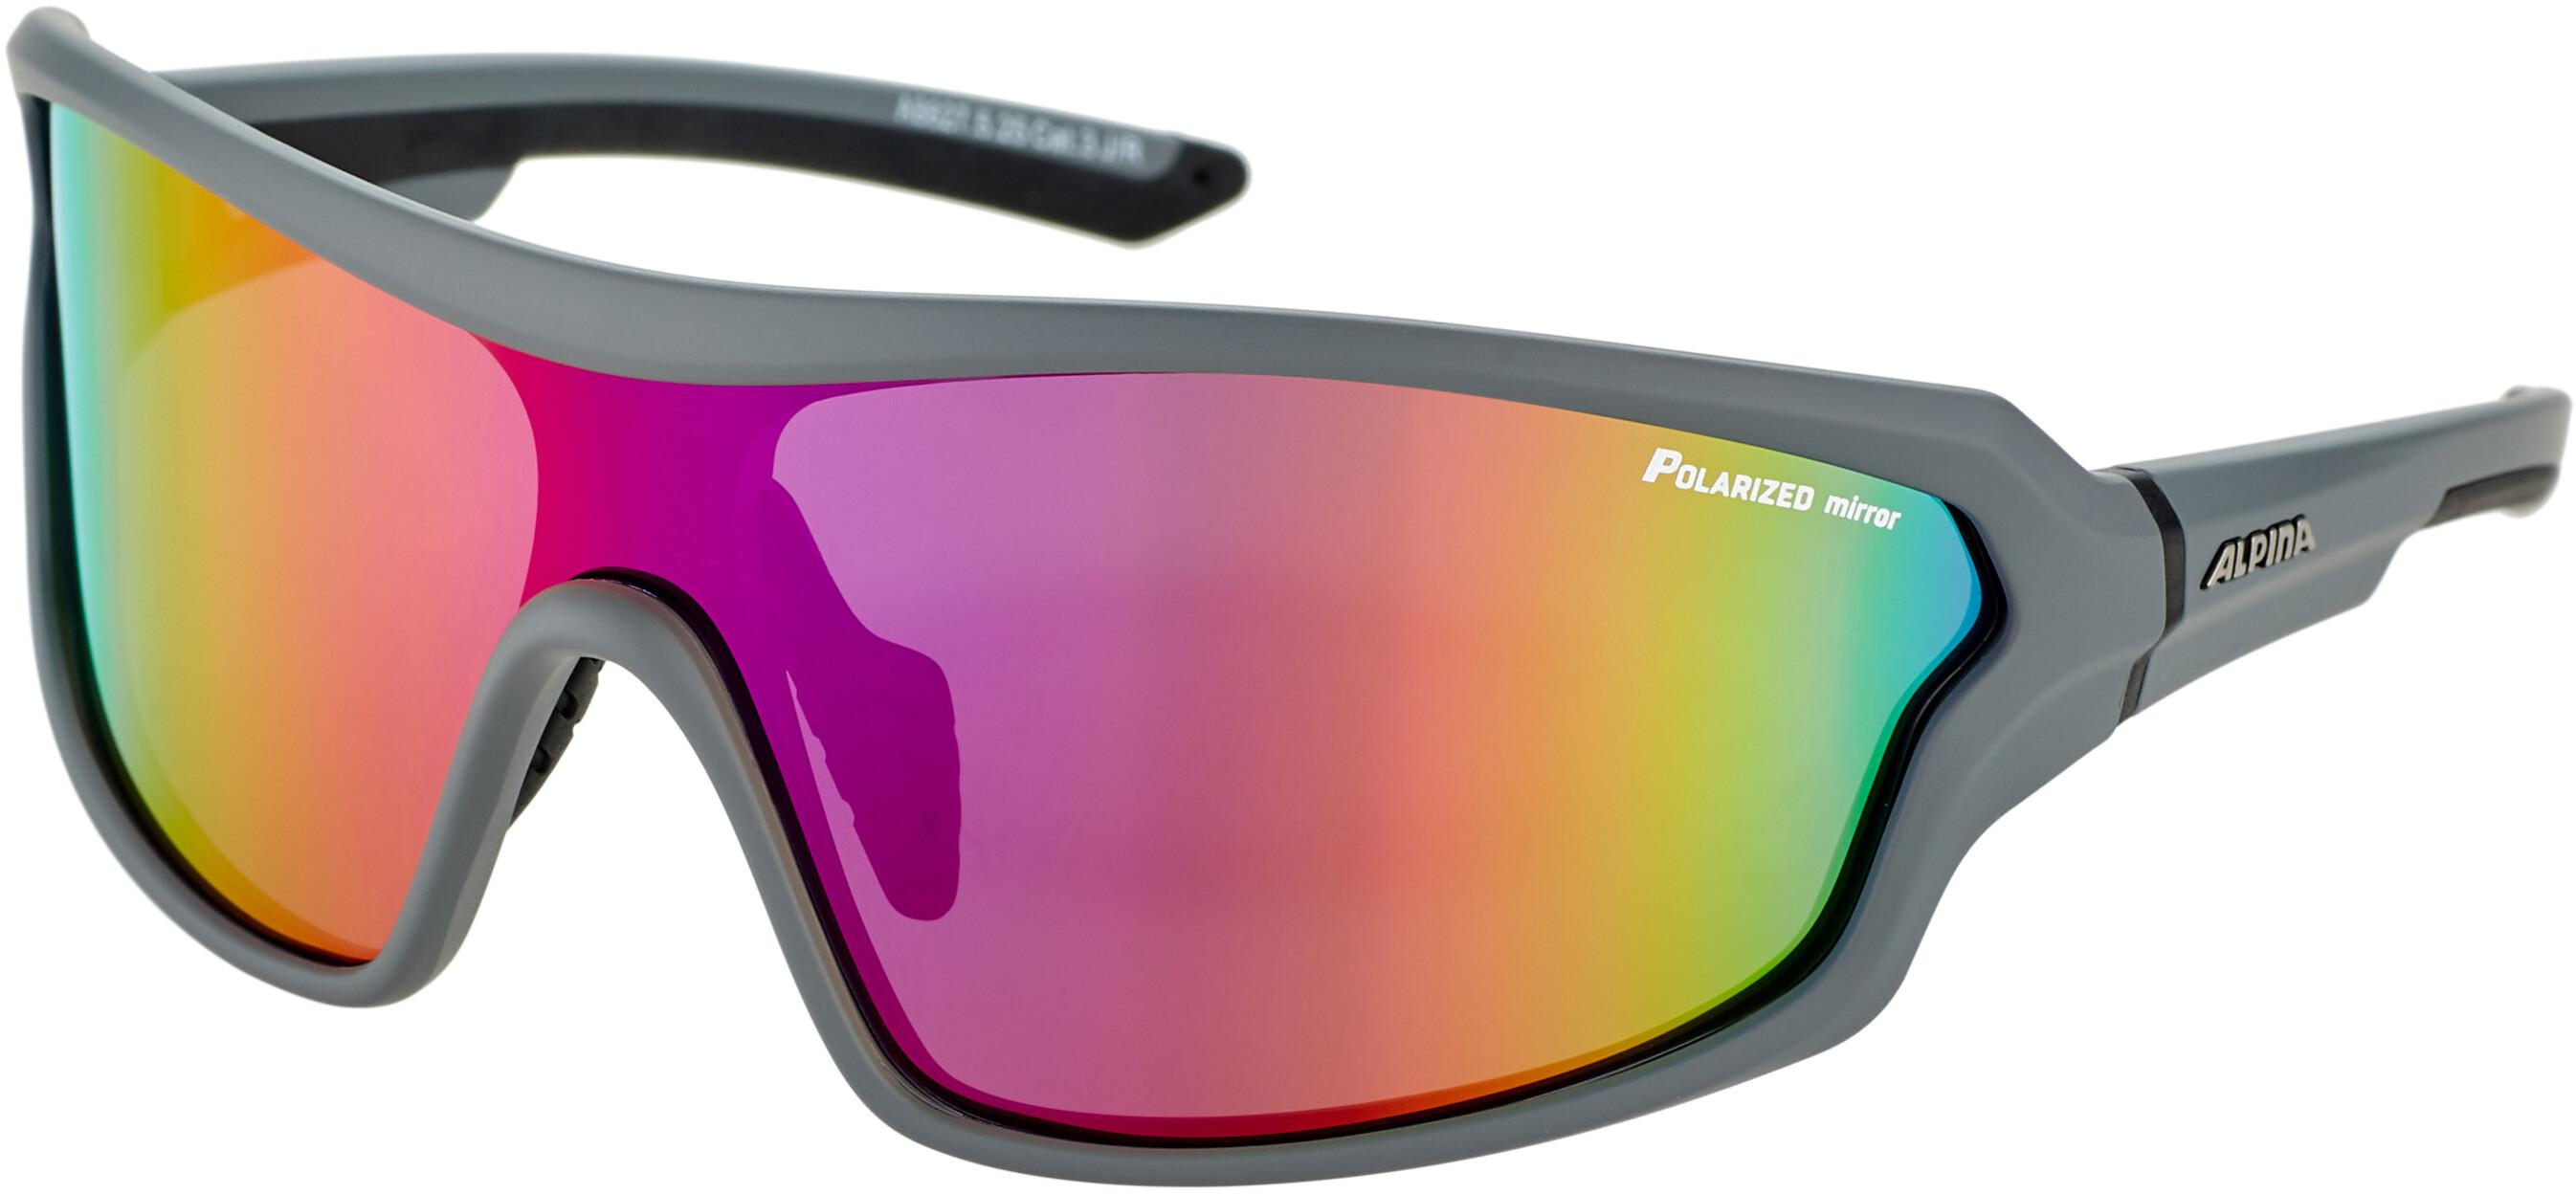 Alpina Lyron Shield P Glasses Grey Matt Black Purple Mirror At Addnature Co Uk